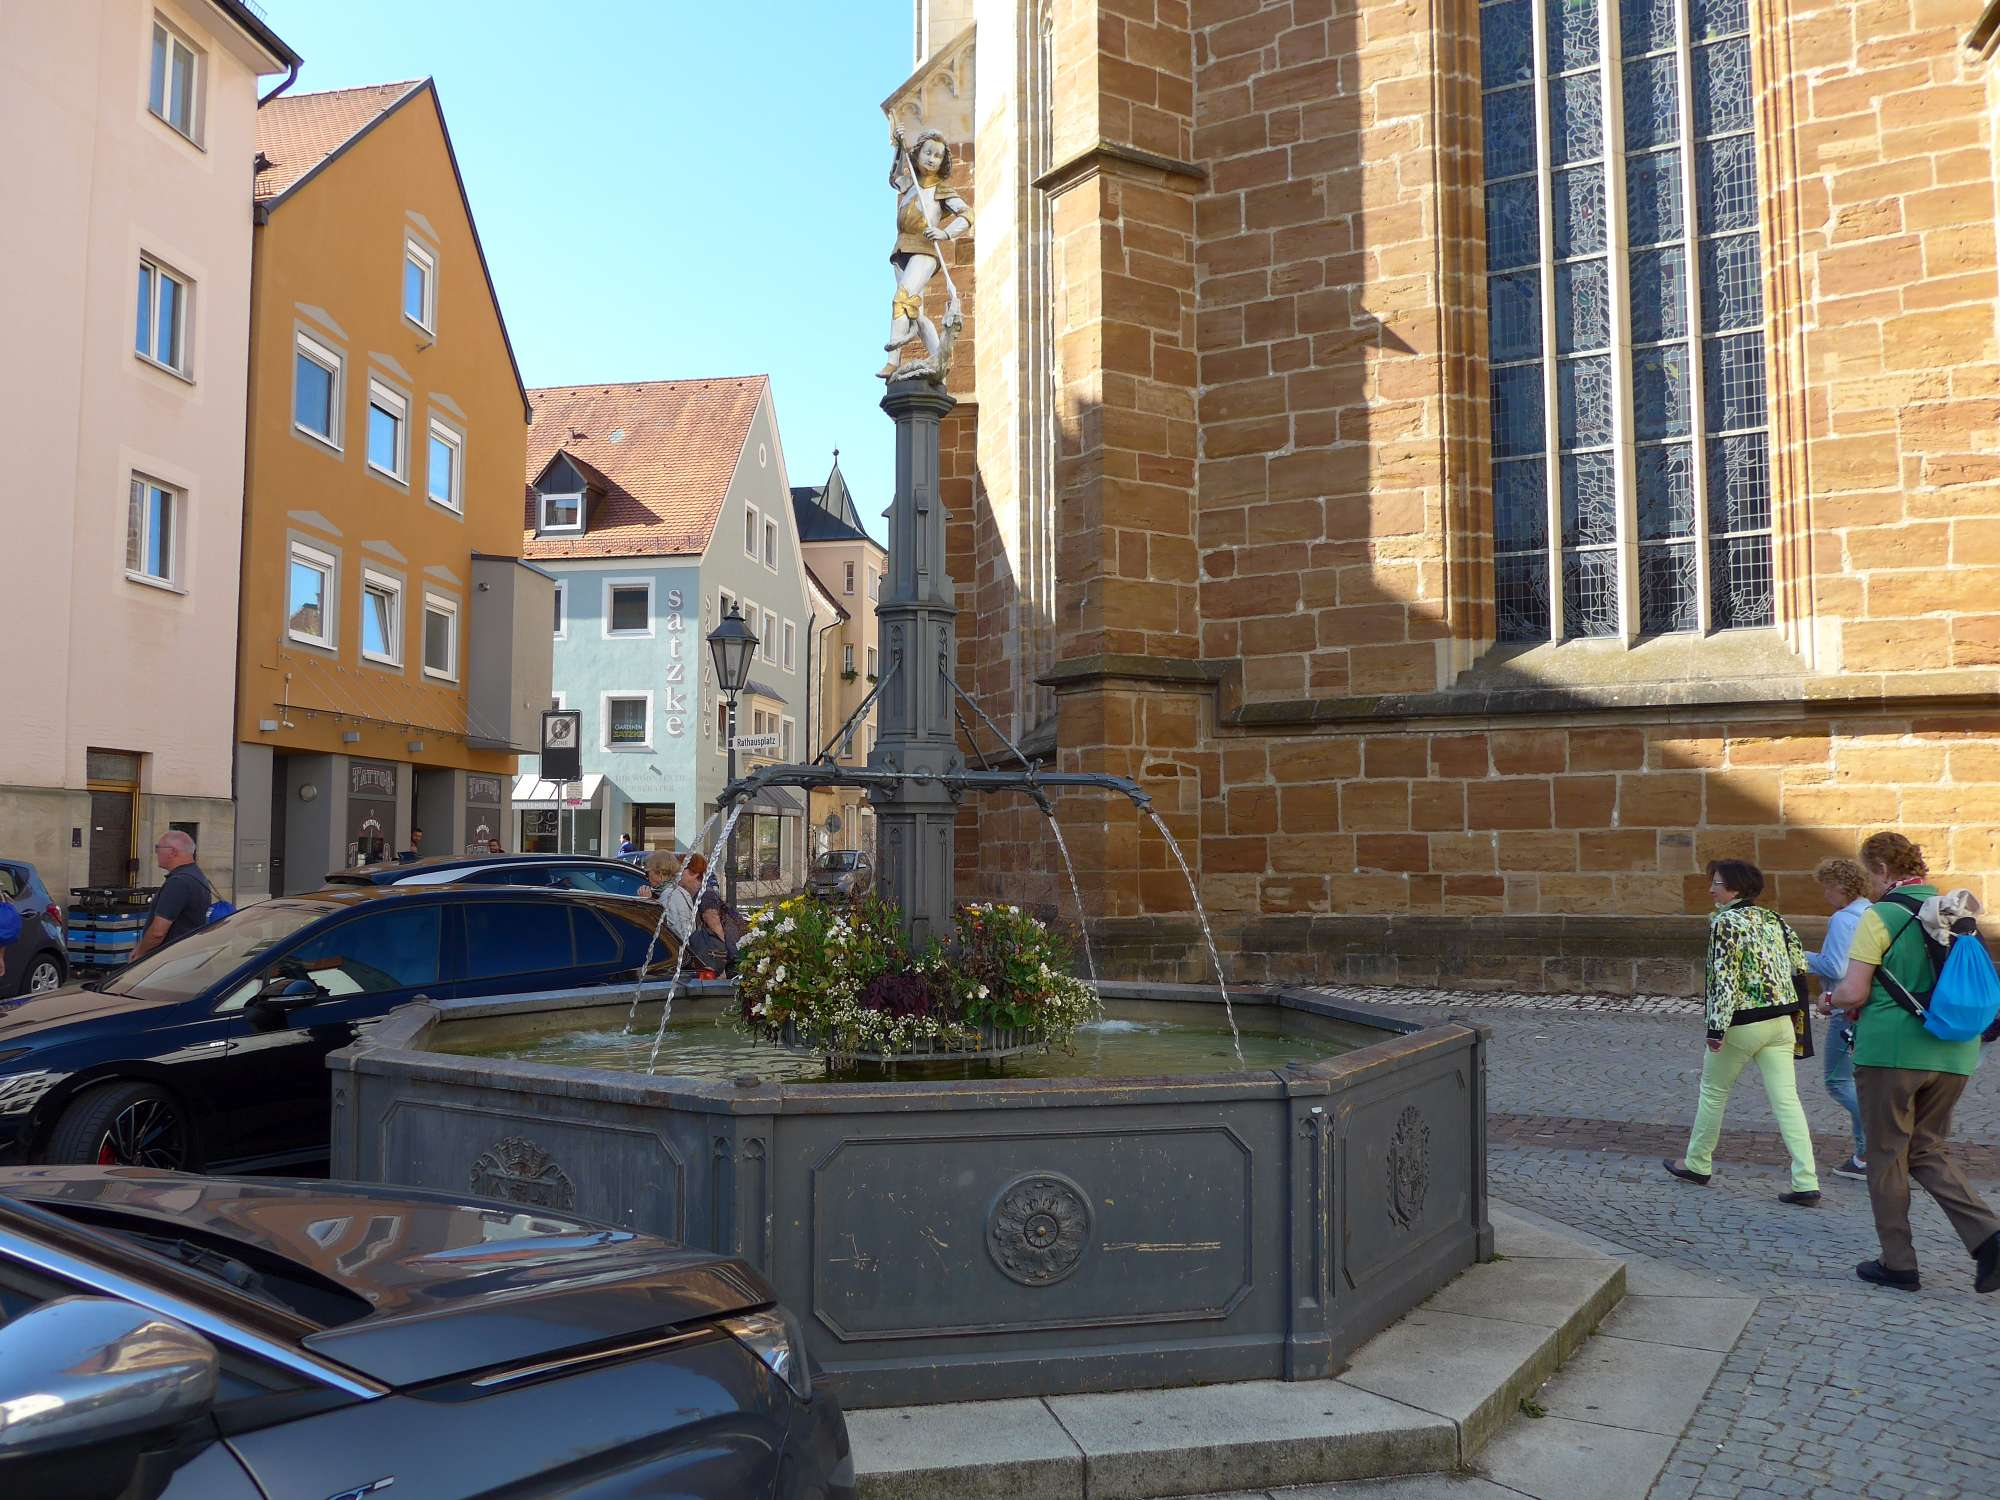 St. Johannes Münster